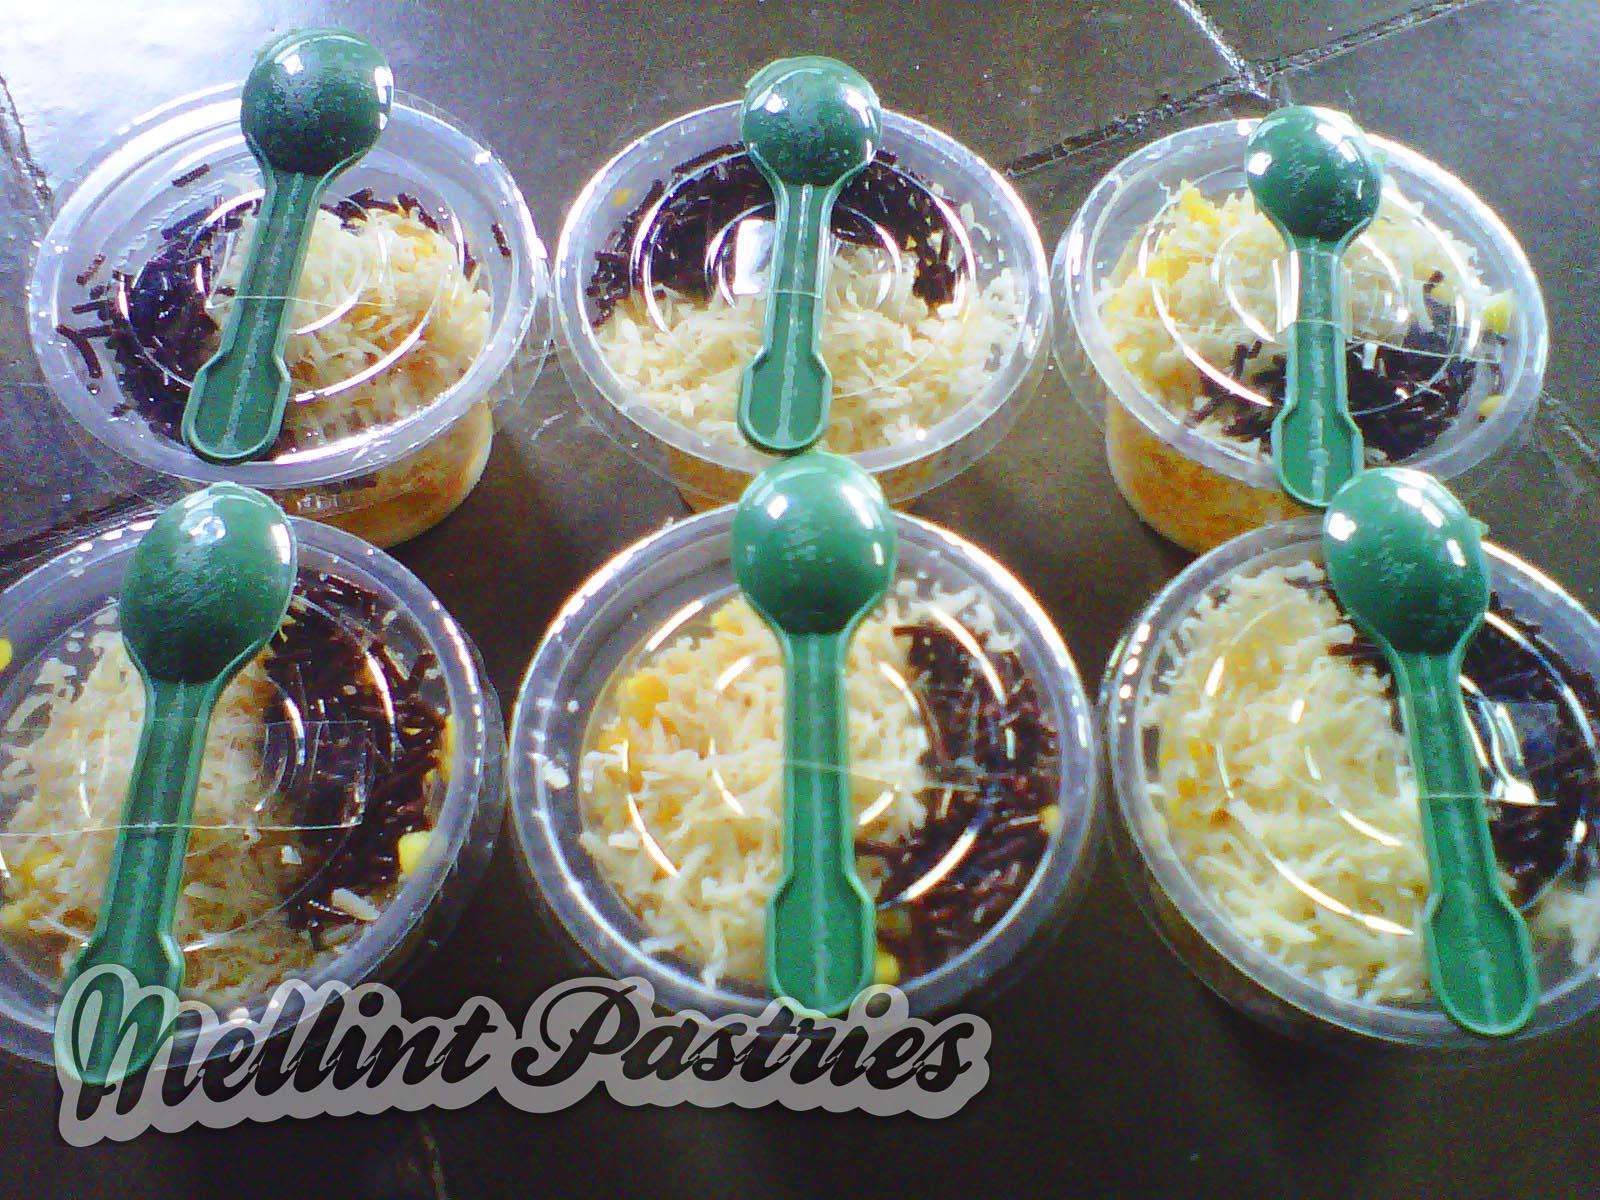 Jasukeme spesialis kue ulang tahun jogja click for details kue